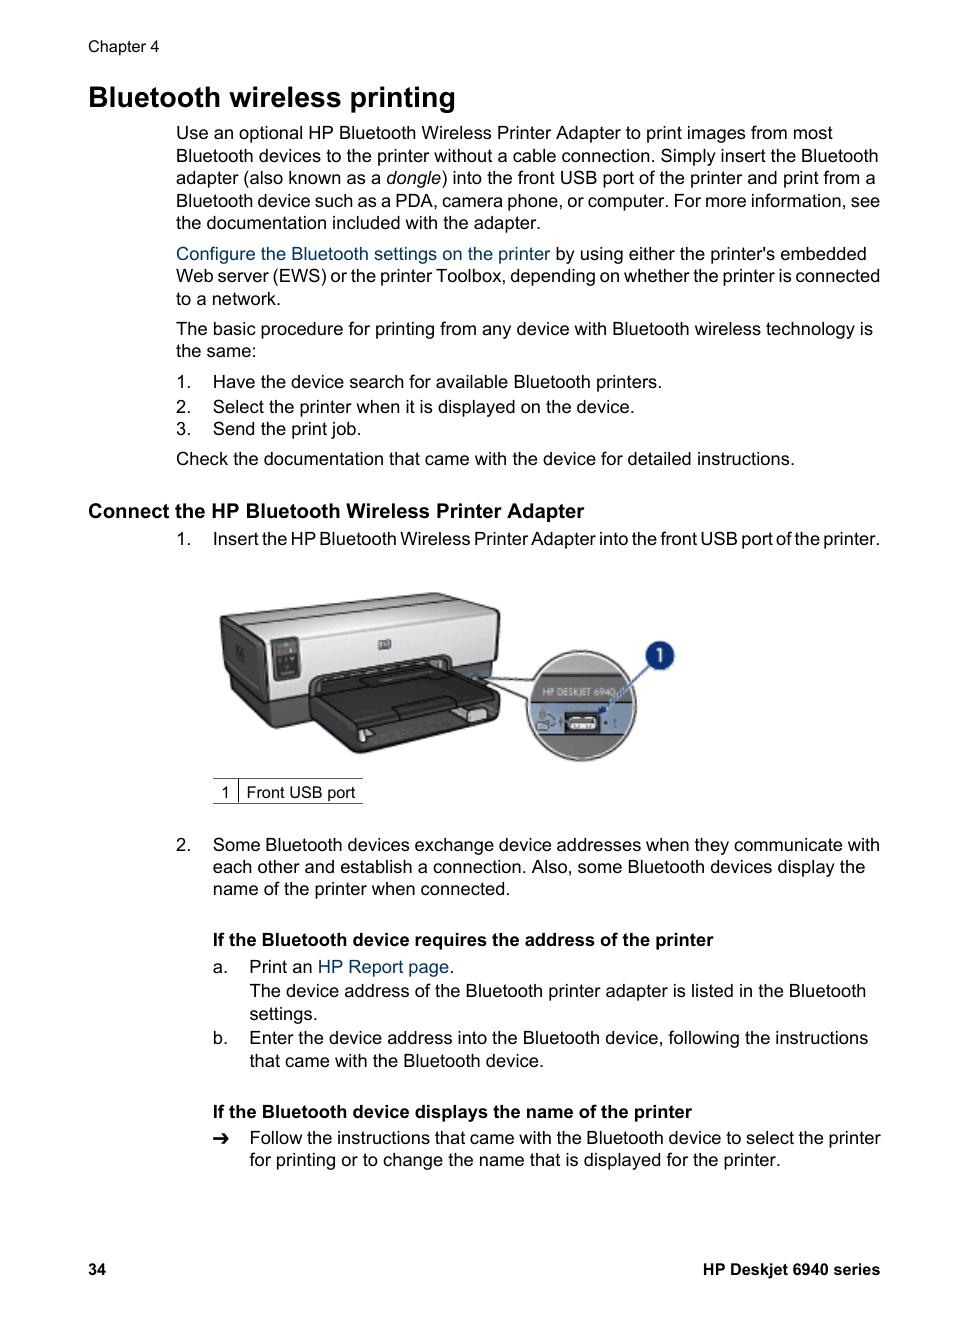 bluetooth wireless printing connect the hp bluetooth wireless rh manualsdir com hp deskjet 6940 manual clean hp deskjet 6940 manual pdf